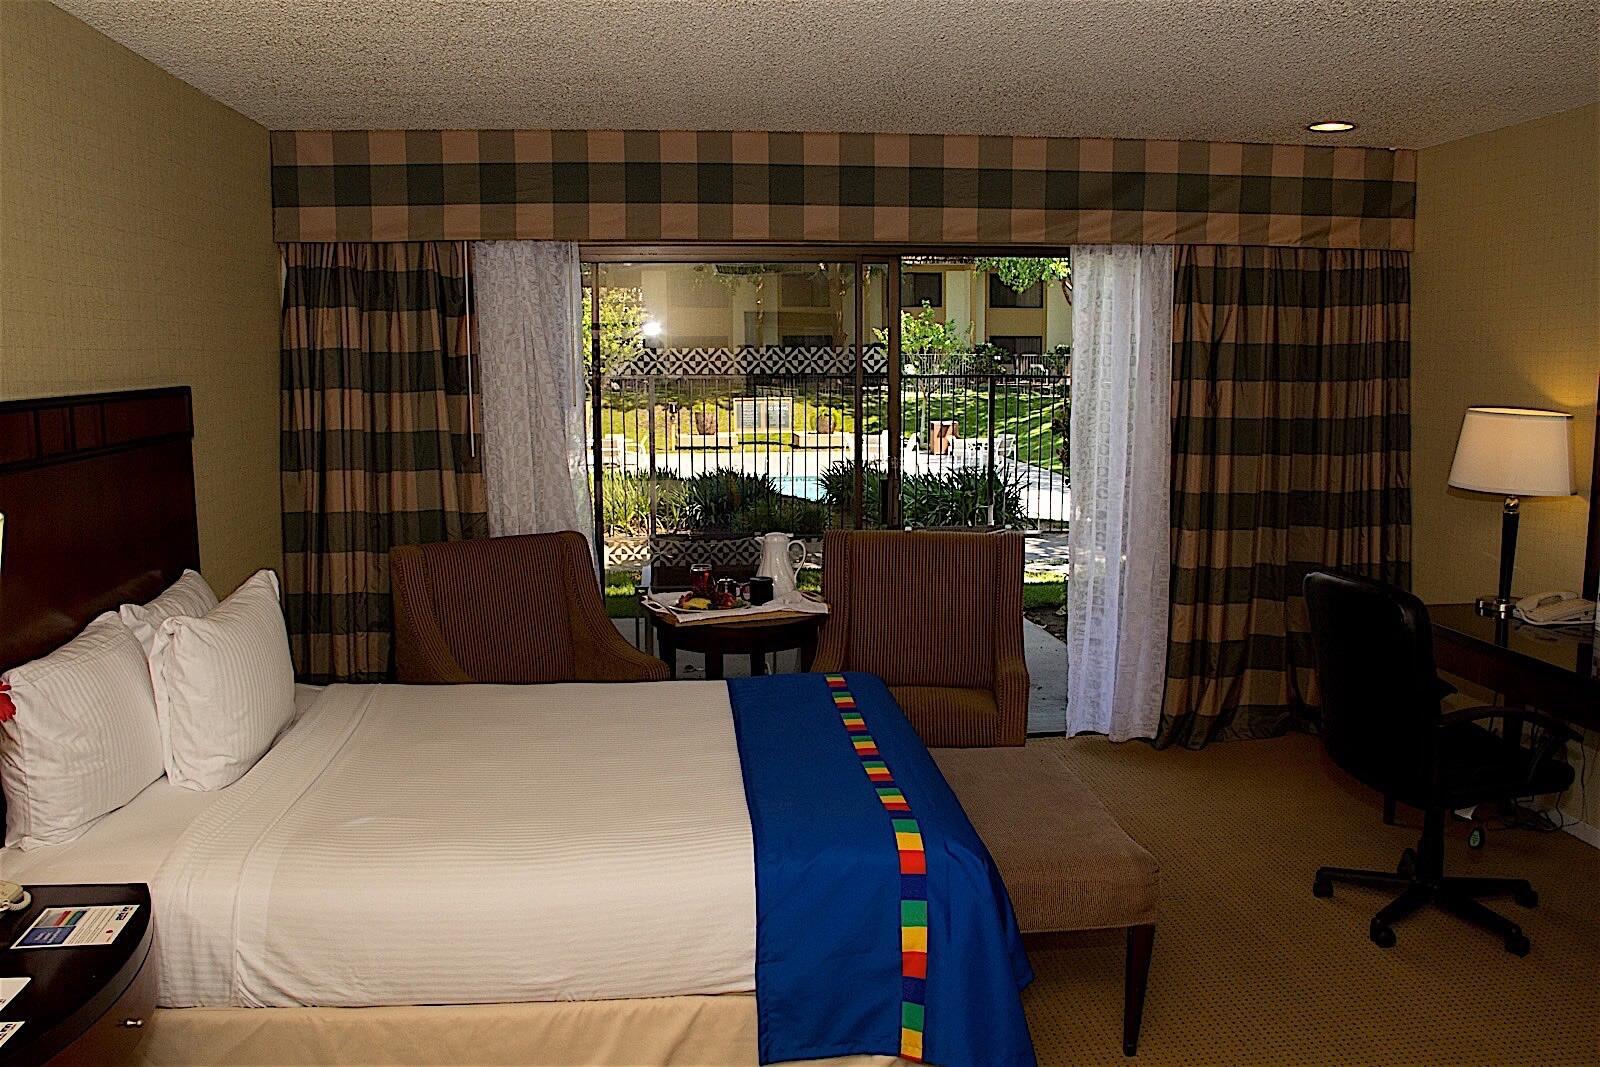 Hotel Fresno Standard King Room